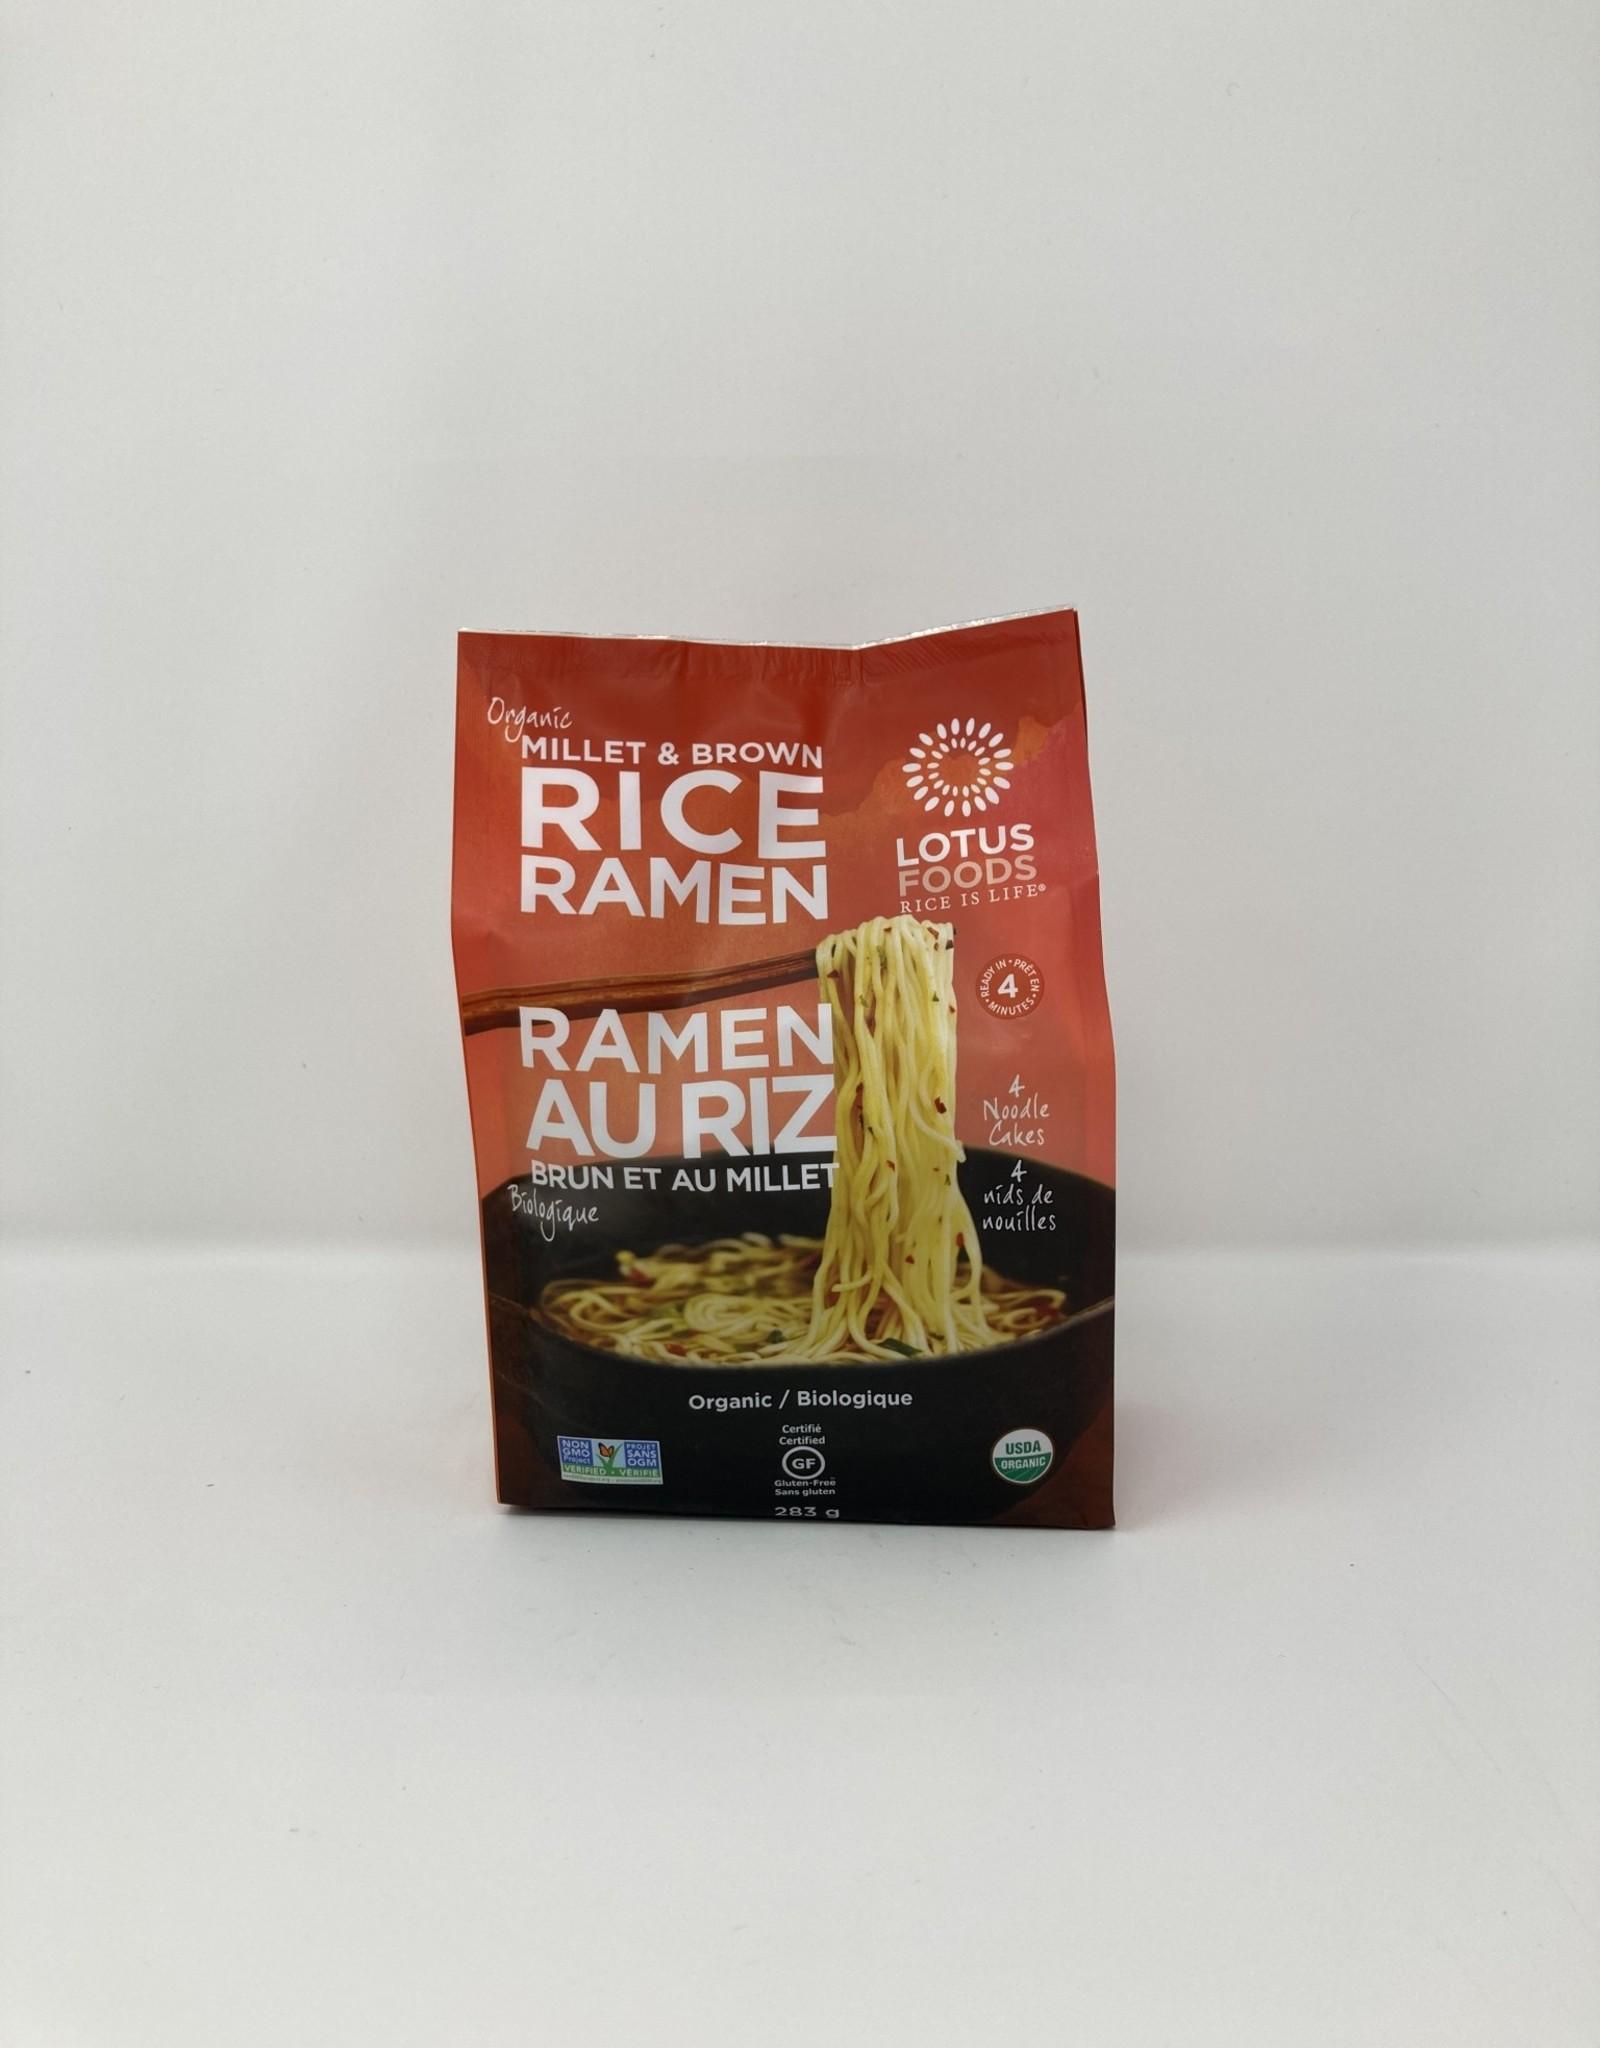 Lotus Foods Lotus Foods - Organic Rice Ramen 4 pack, Millet & Brown Rice